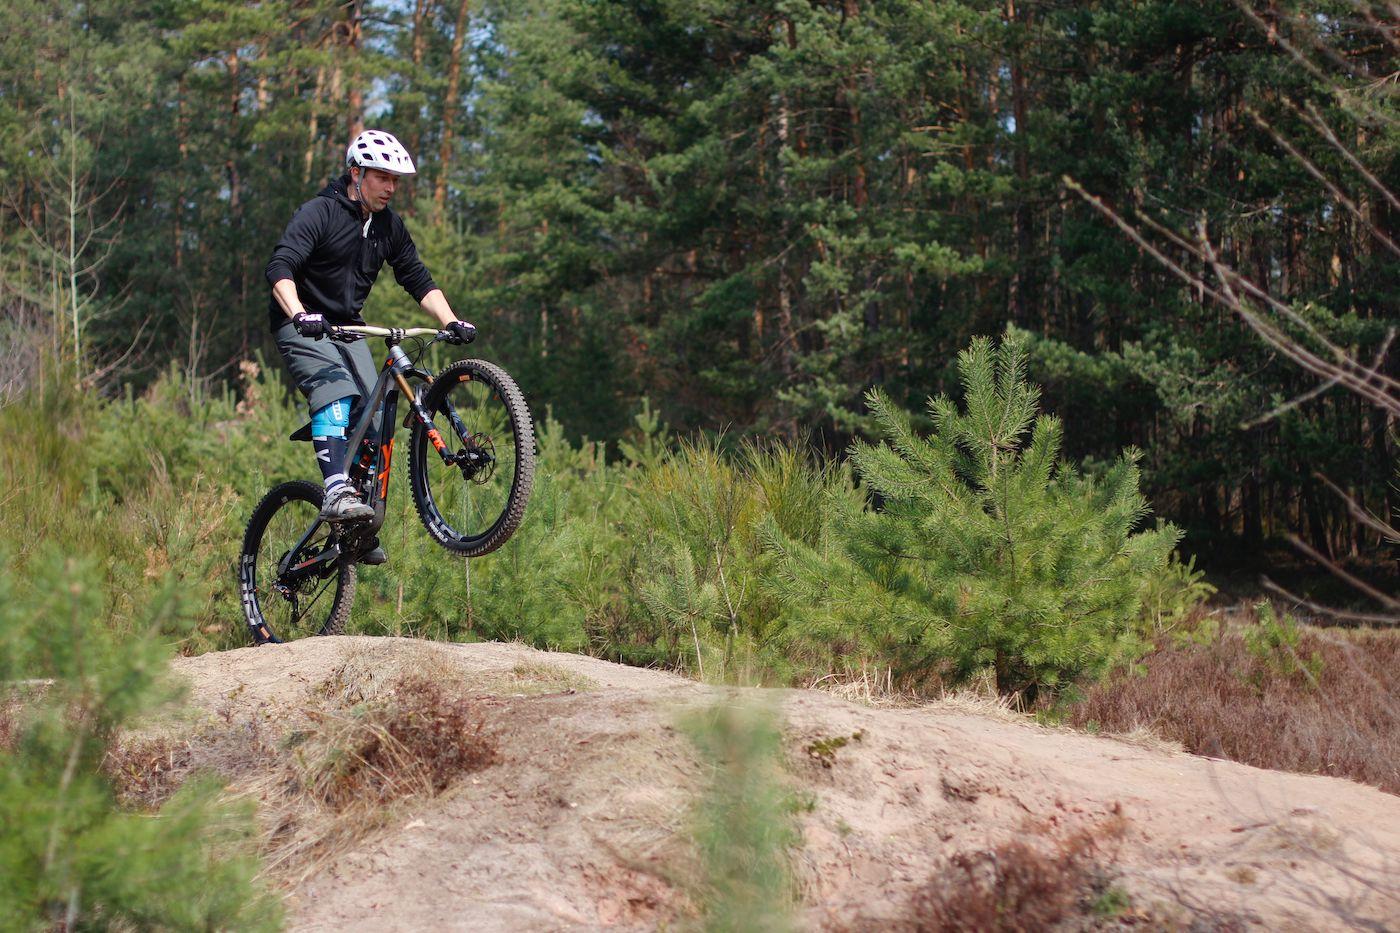 Experten Fahrtechnik Kurs in Nürnberg - Rock my Trail MTB und eBike Bikeschule-5